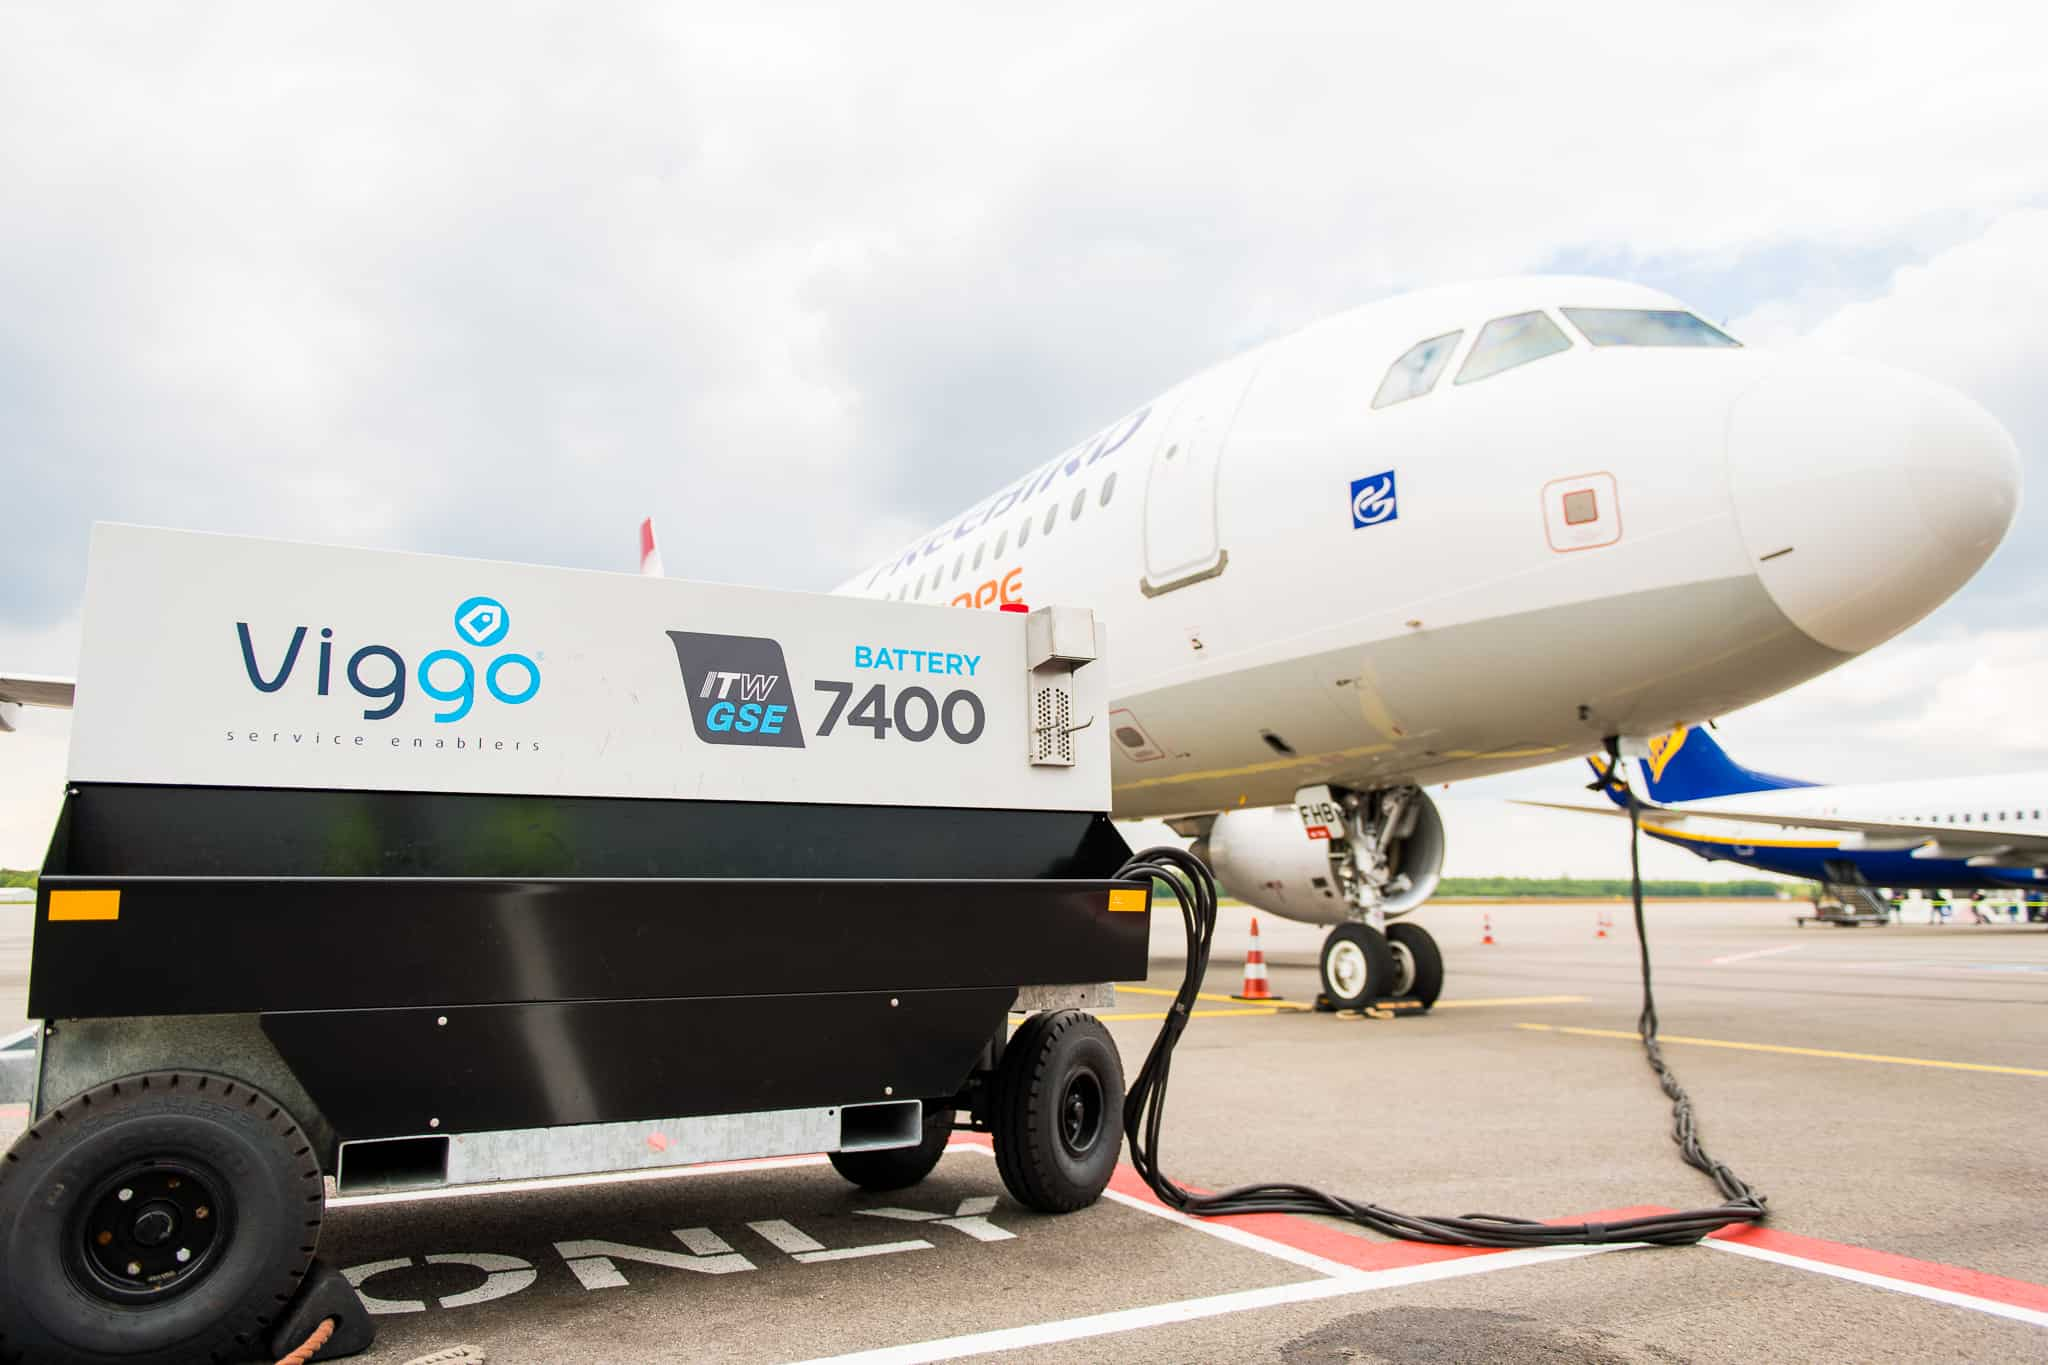 itw gse 7400 eGPU at VIGGO Service Enablers